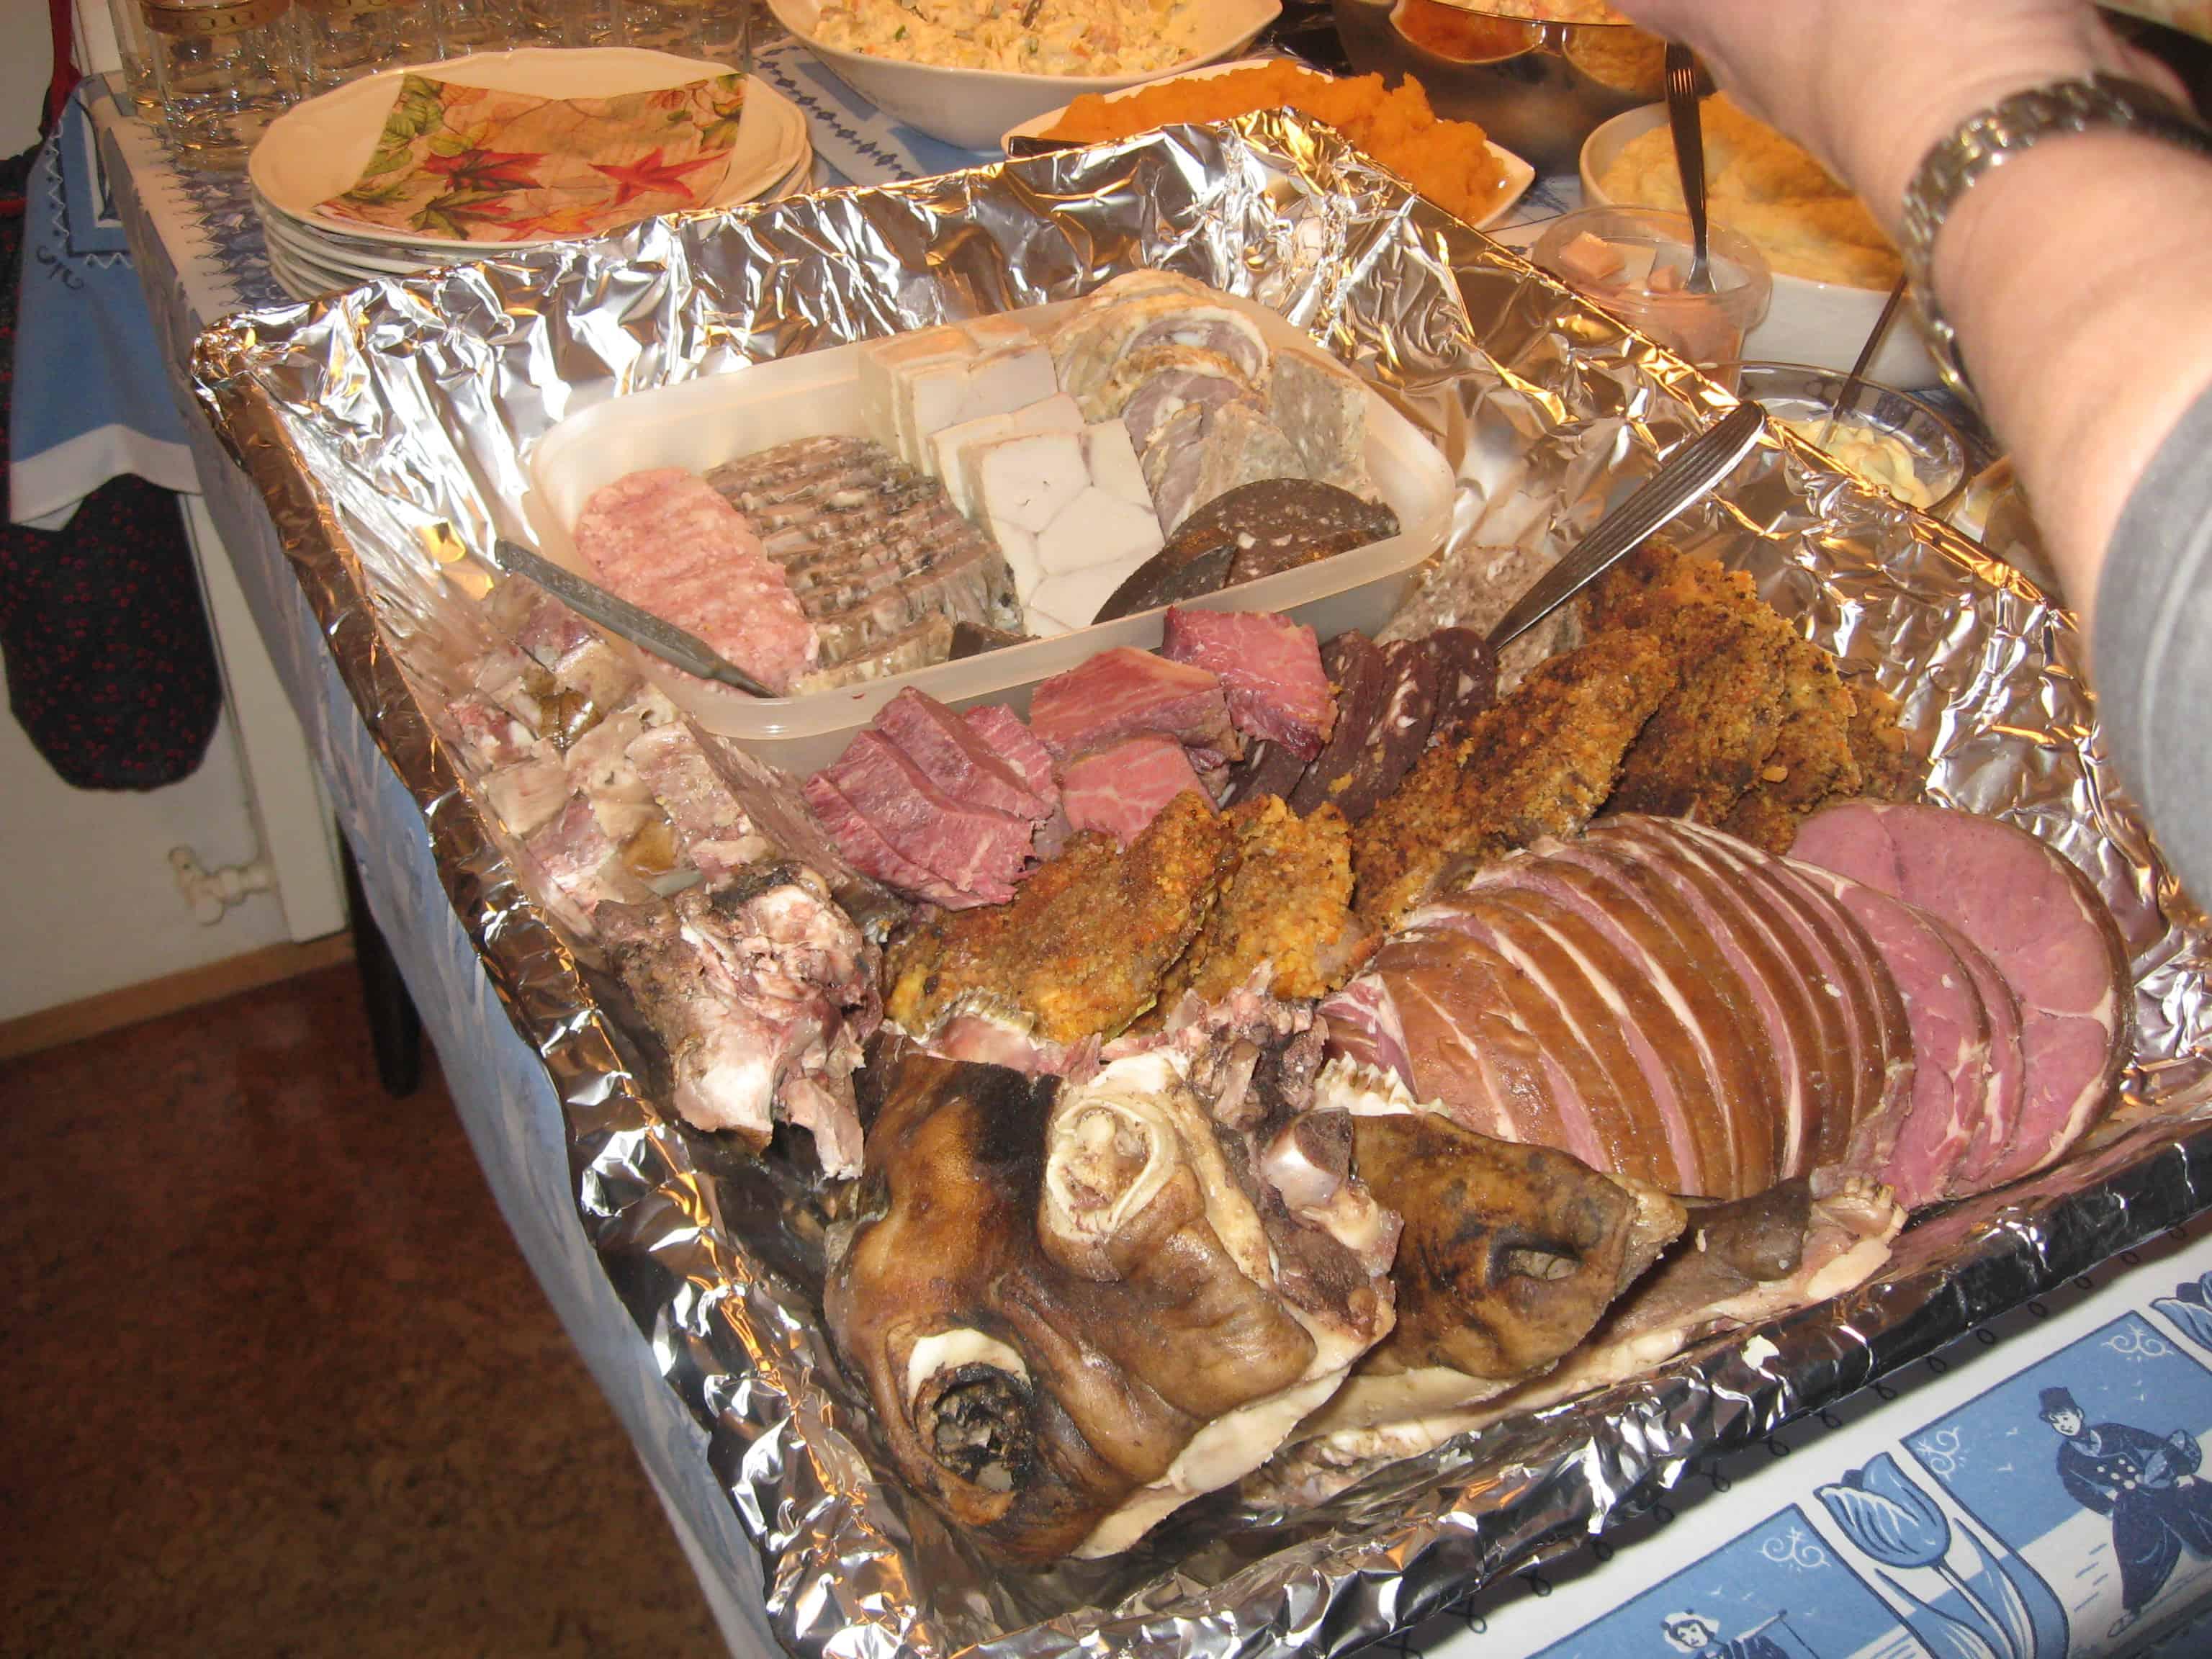 þorrablót - Icelandic traditional food